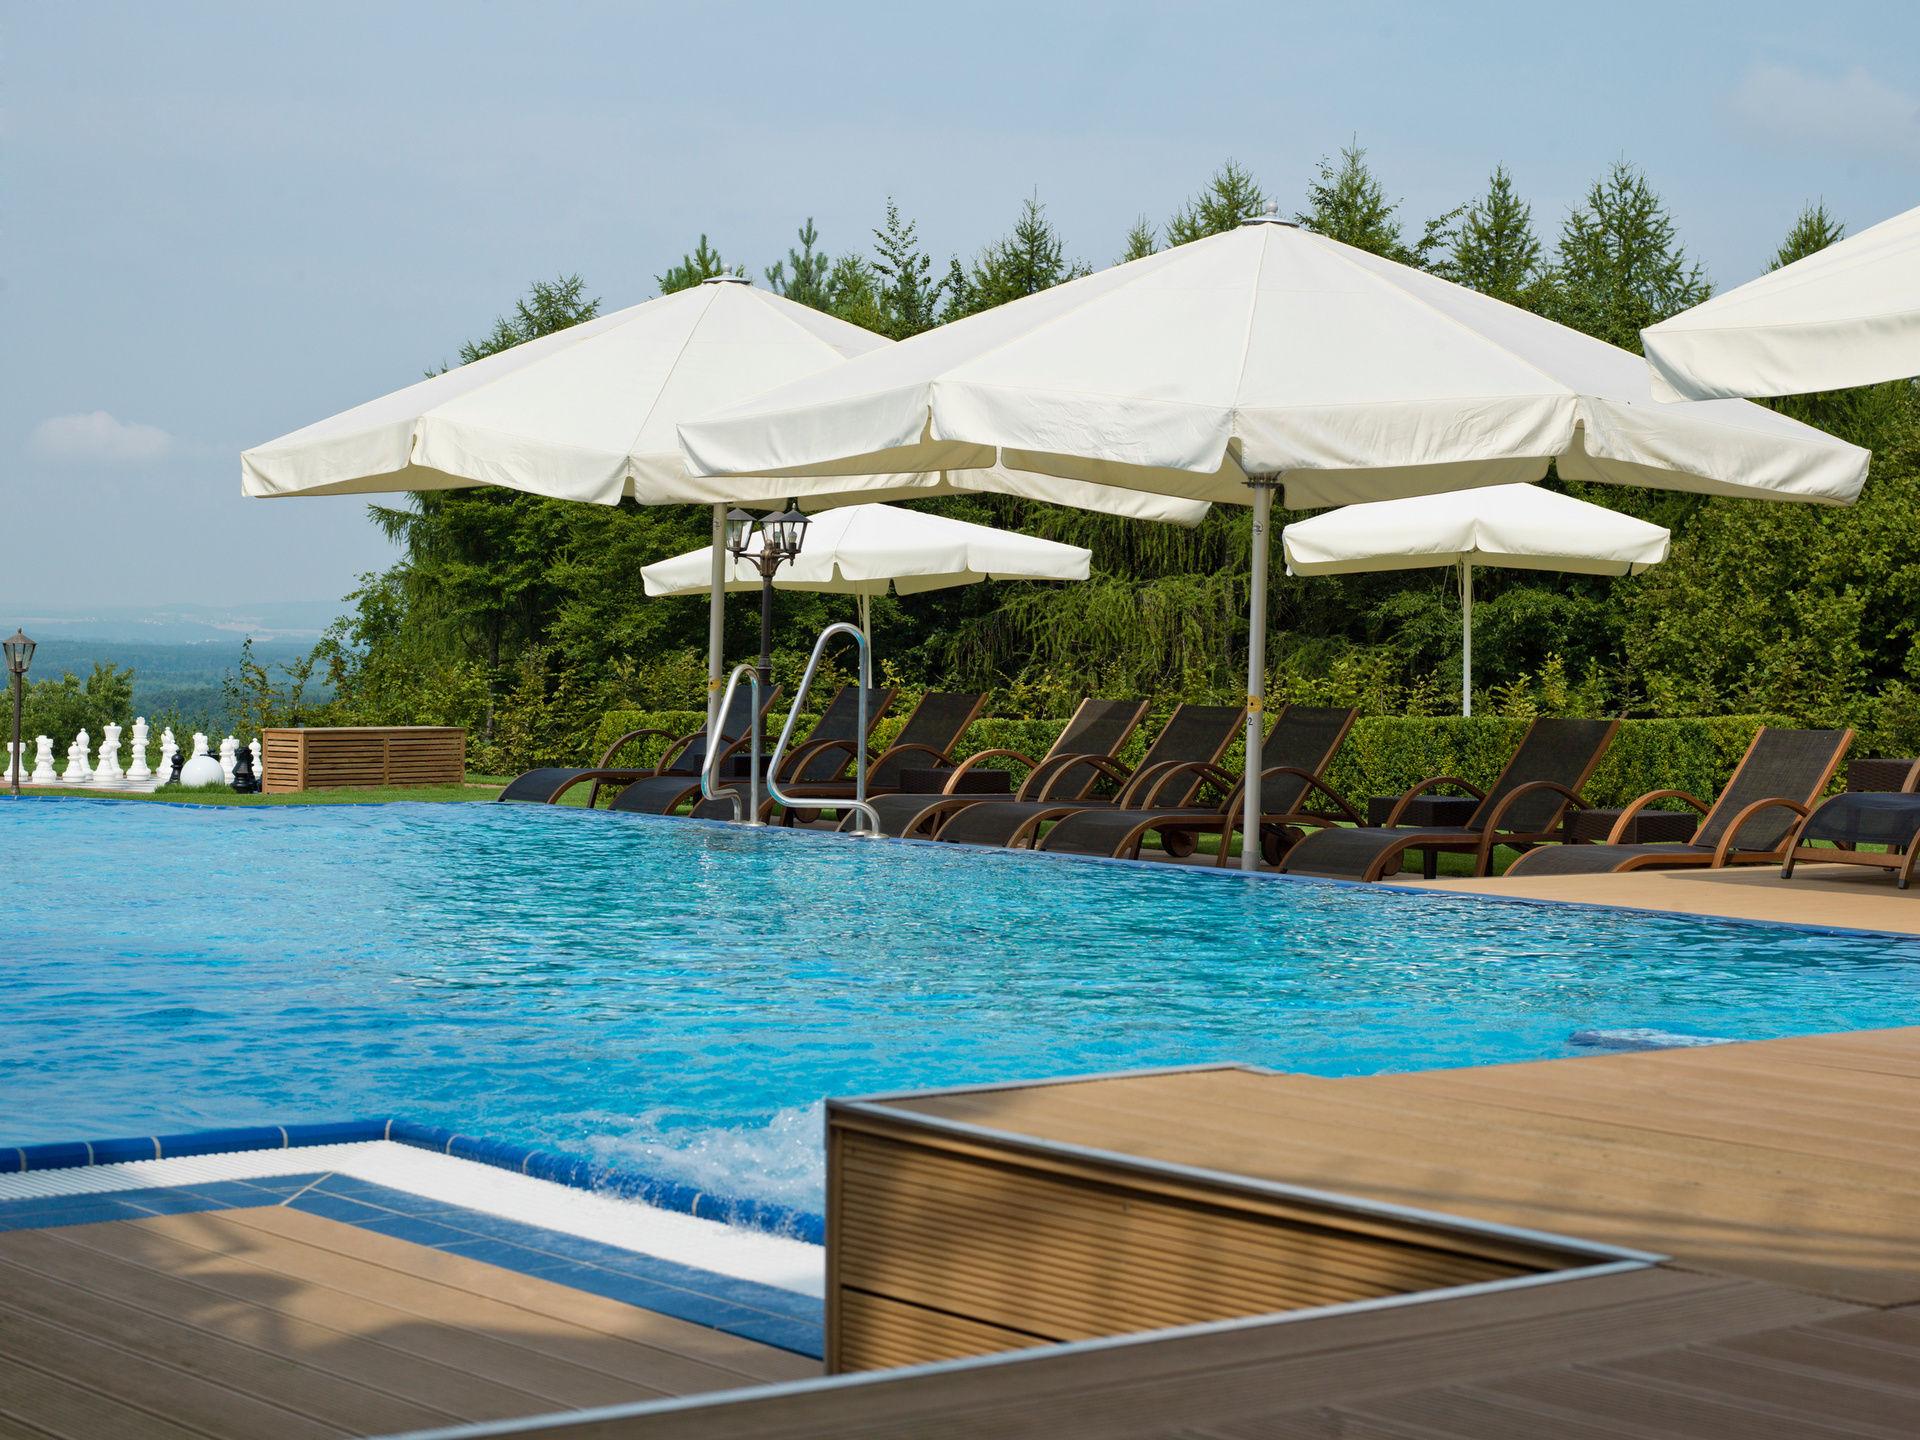 Hotel Oberpfalz Wellness